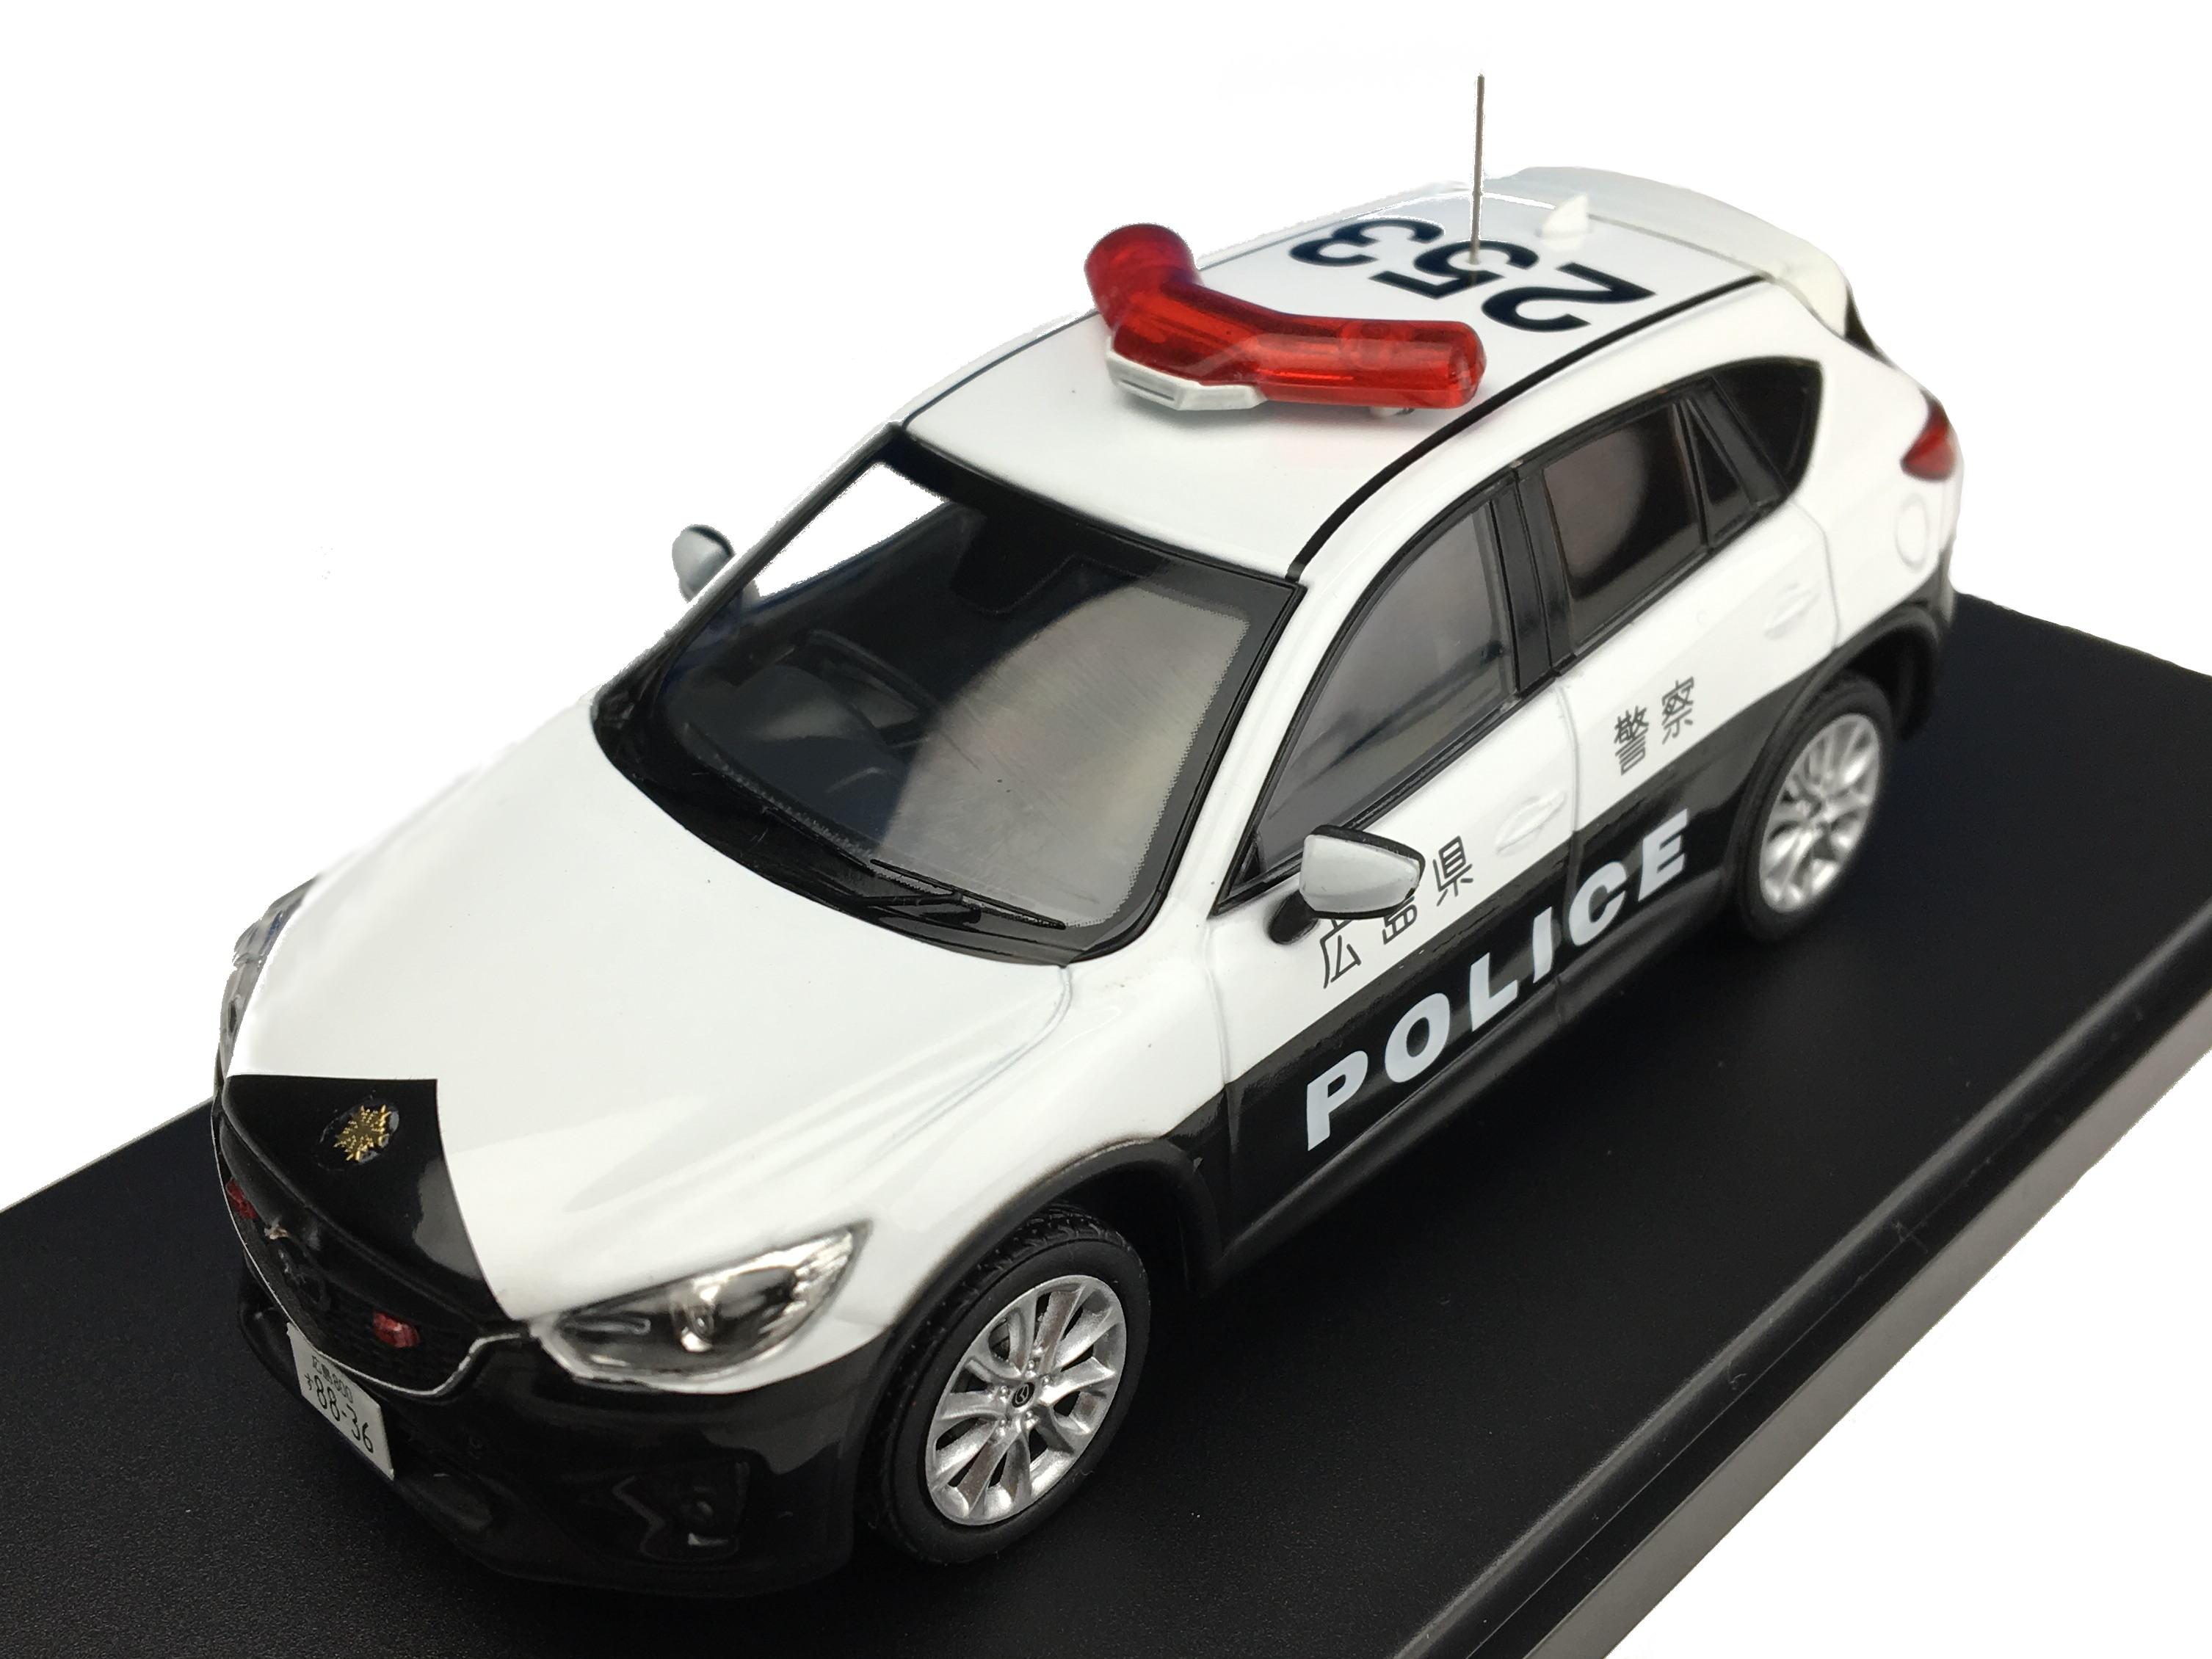 Premium-X/プレミアムX マツダ CX5 広島県警 2013